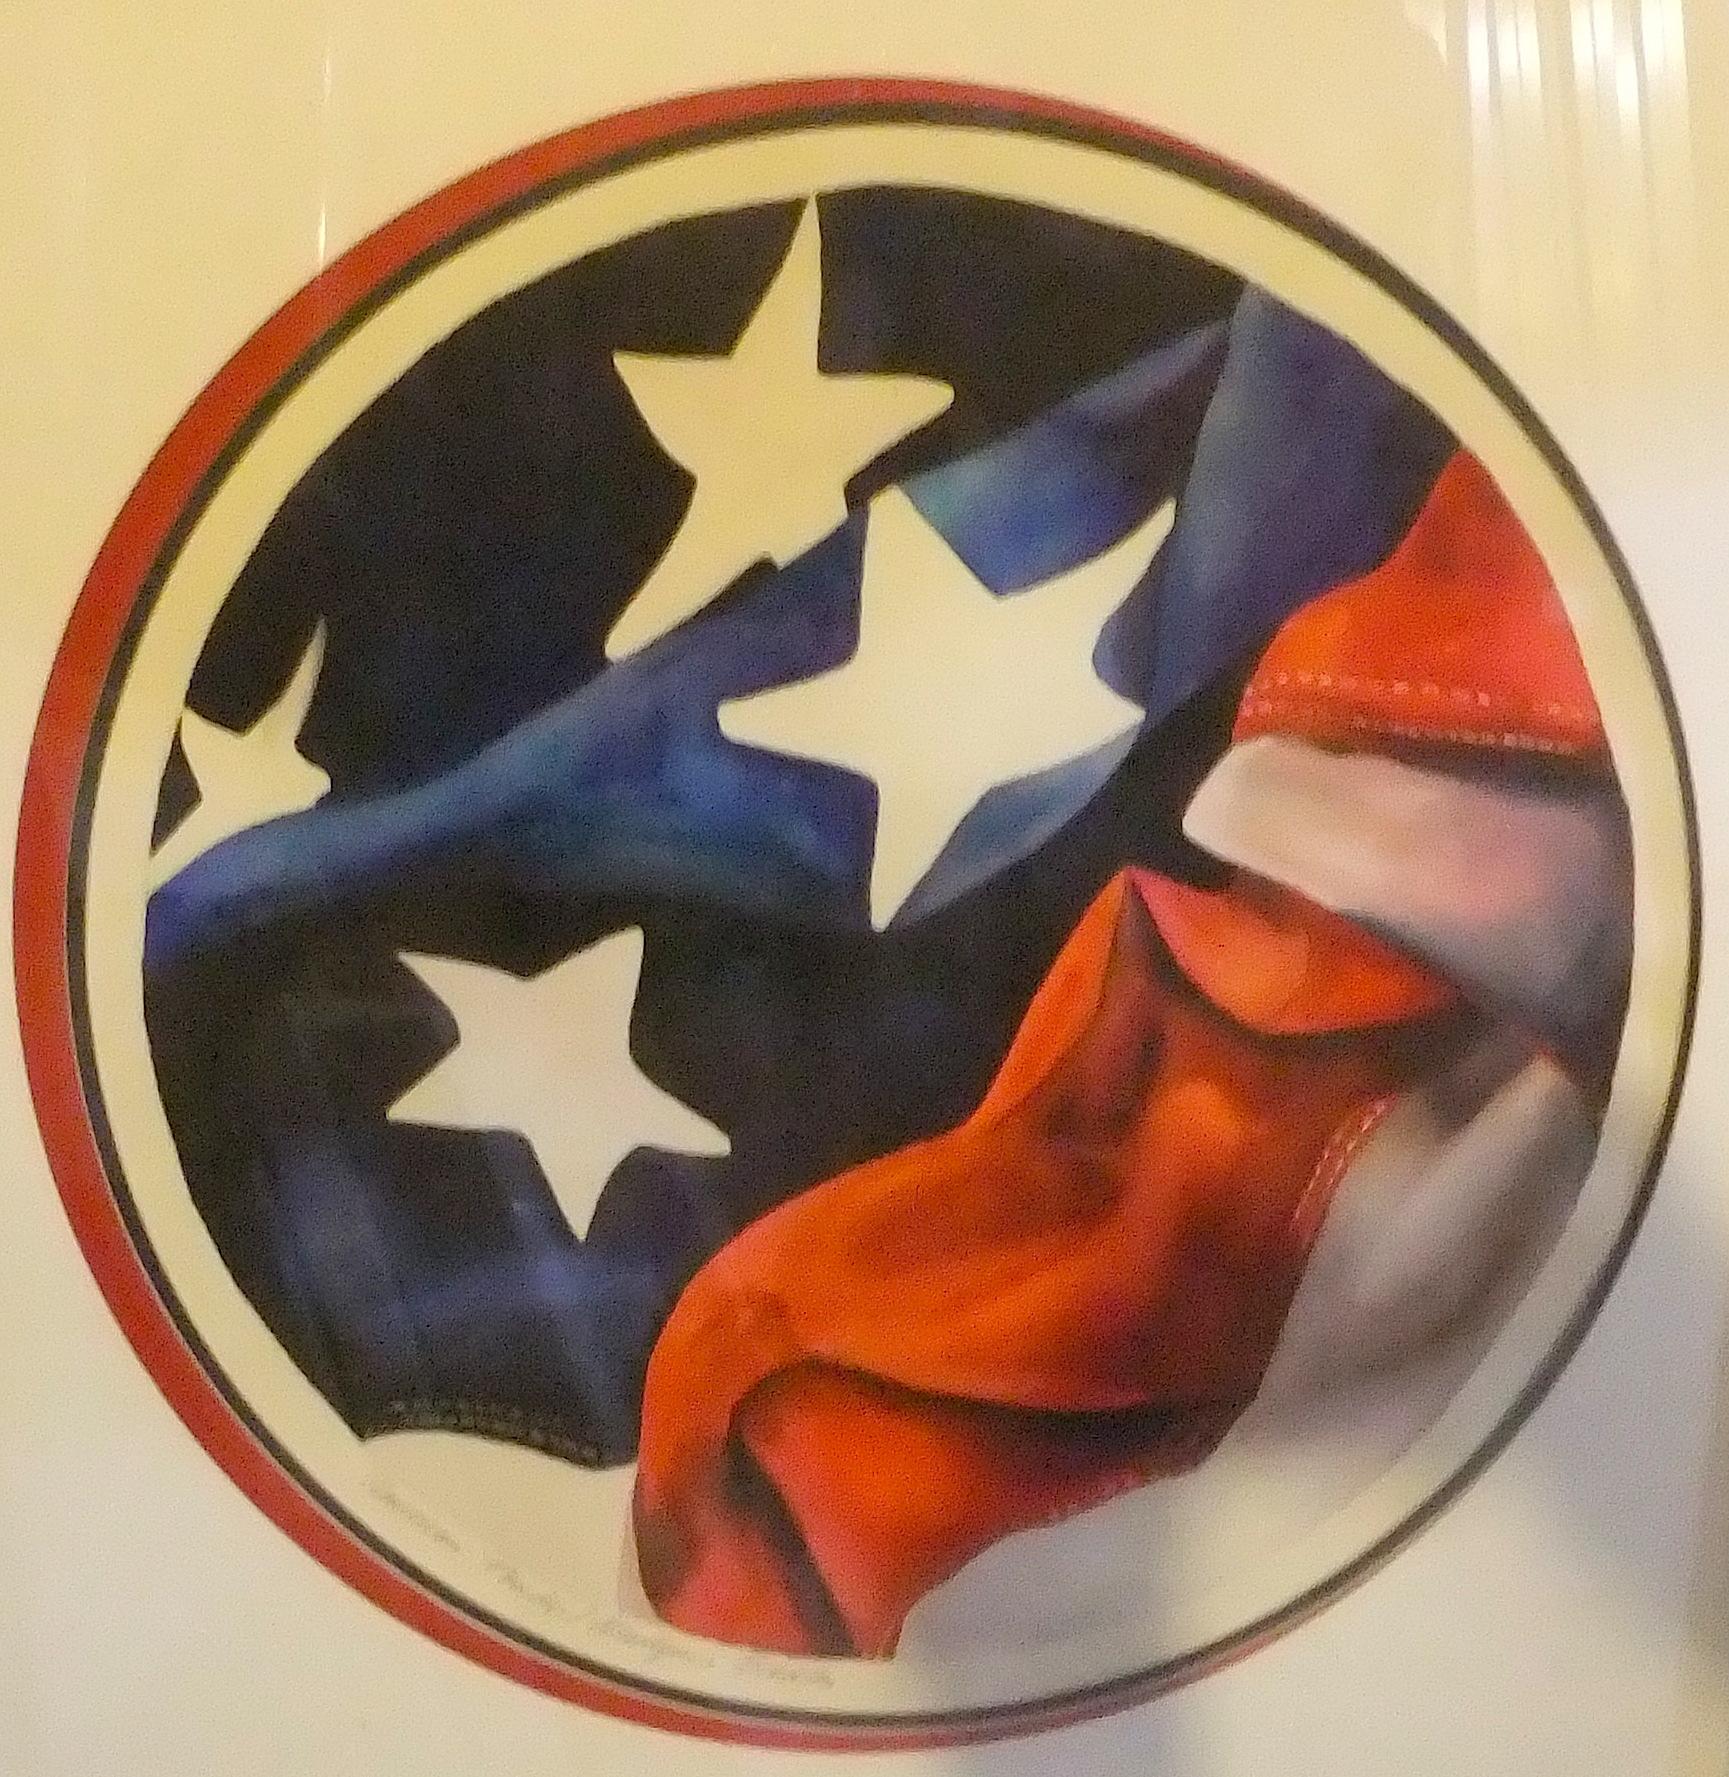 738 Tondo Flag